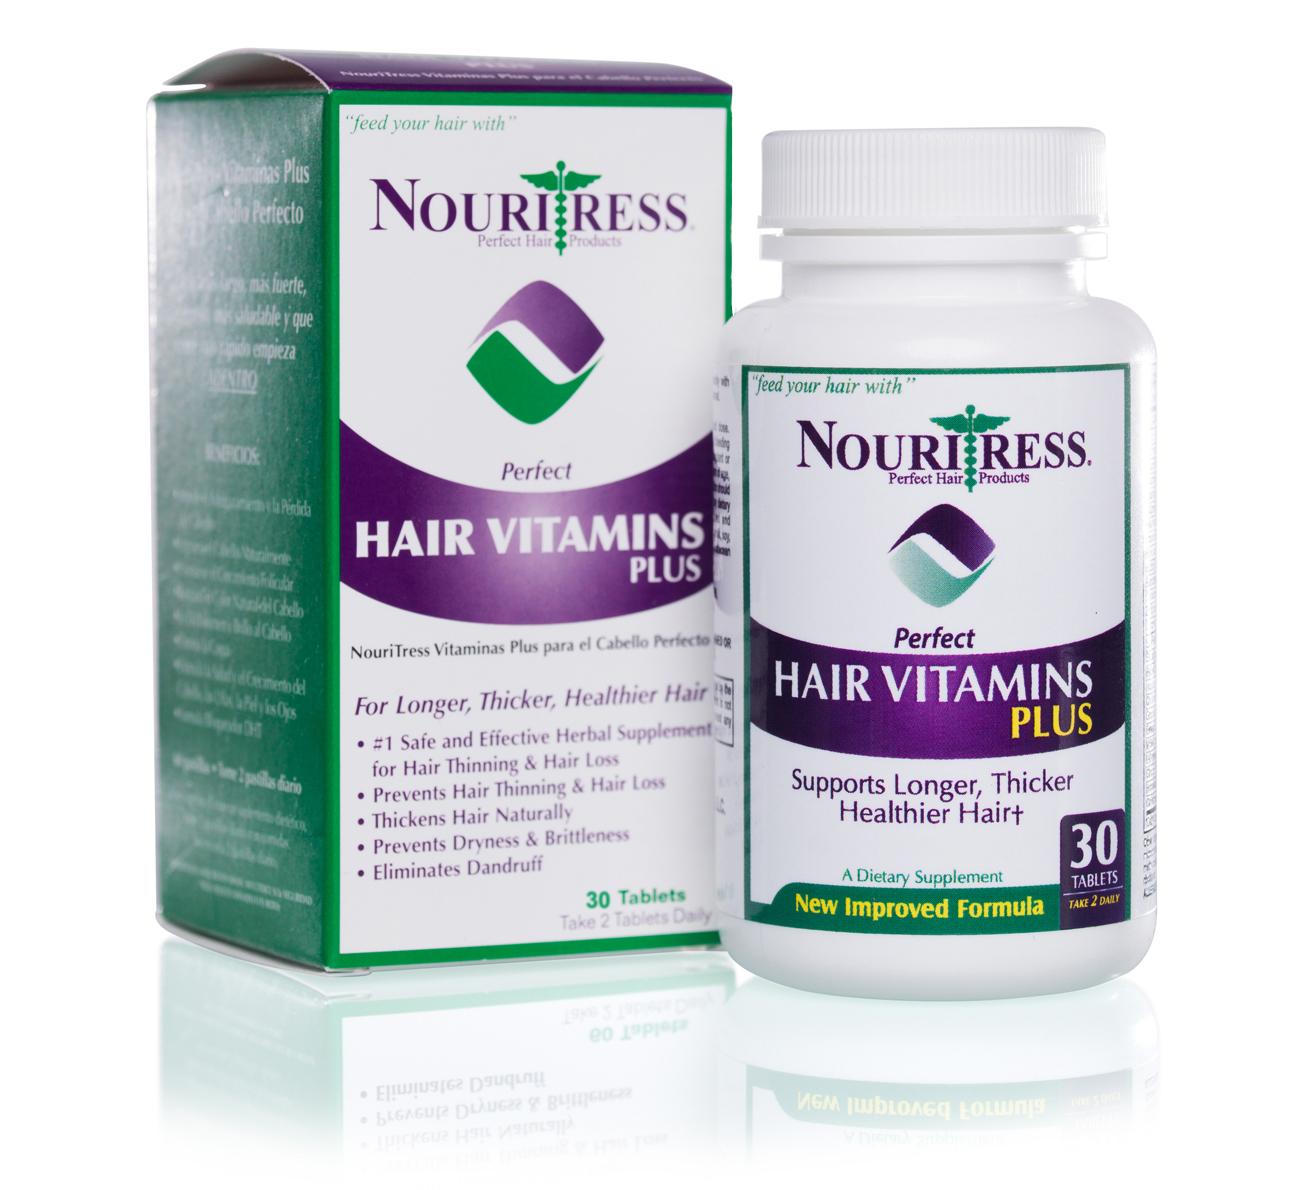 898599001009_NT-Vitamins-PLUS122118